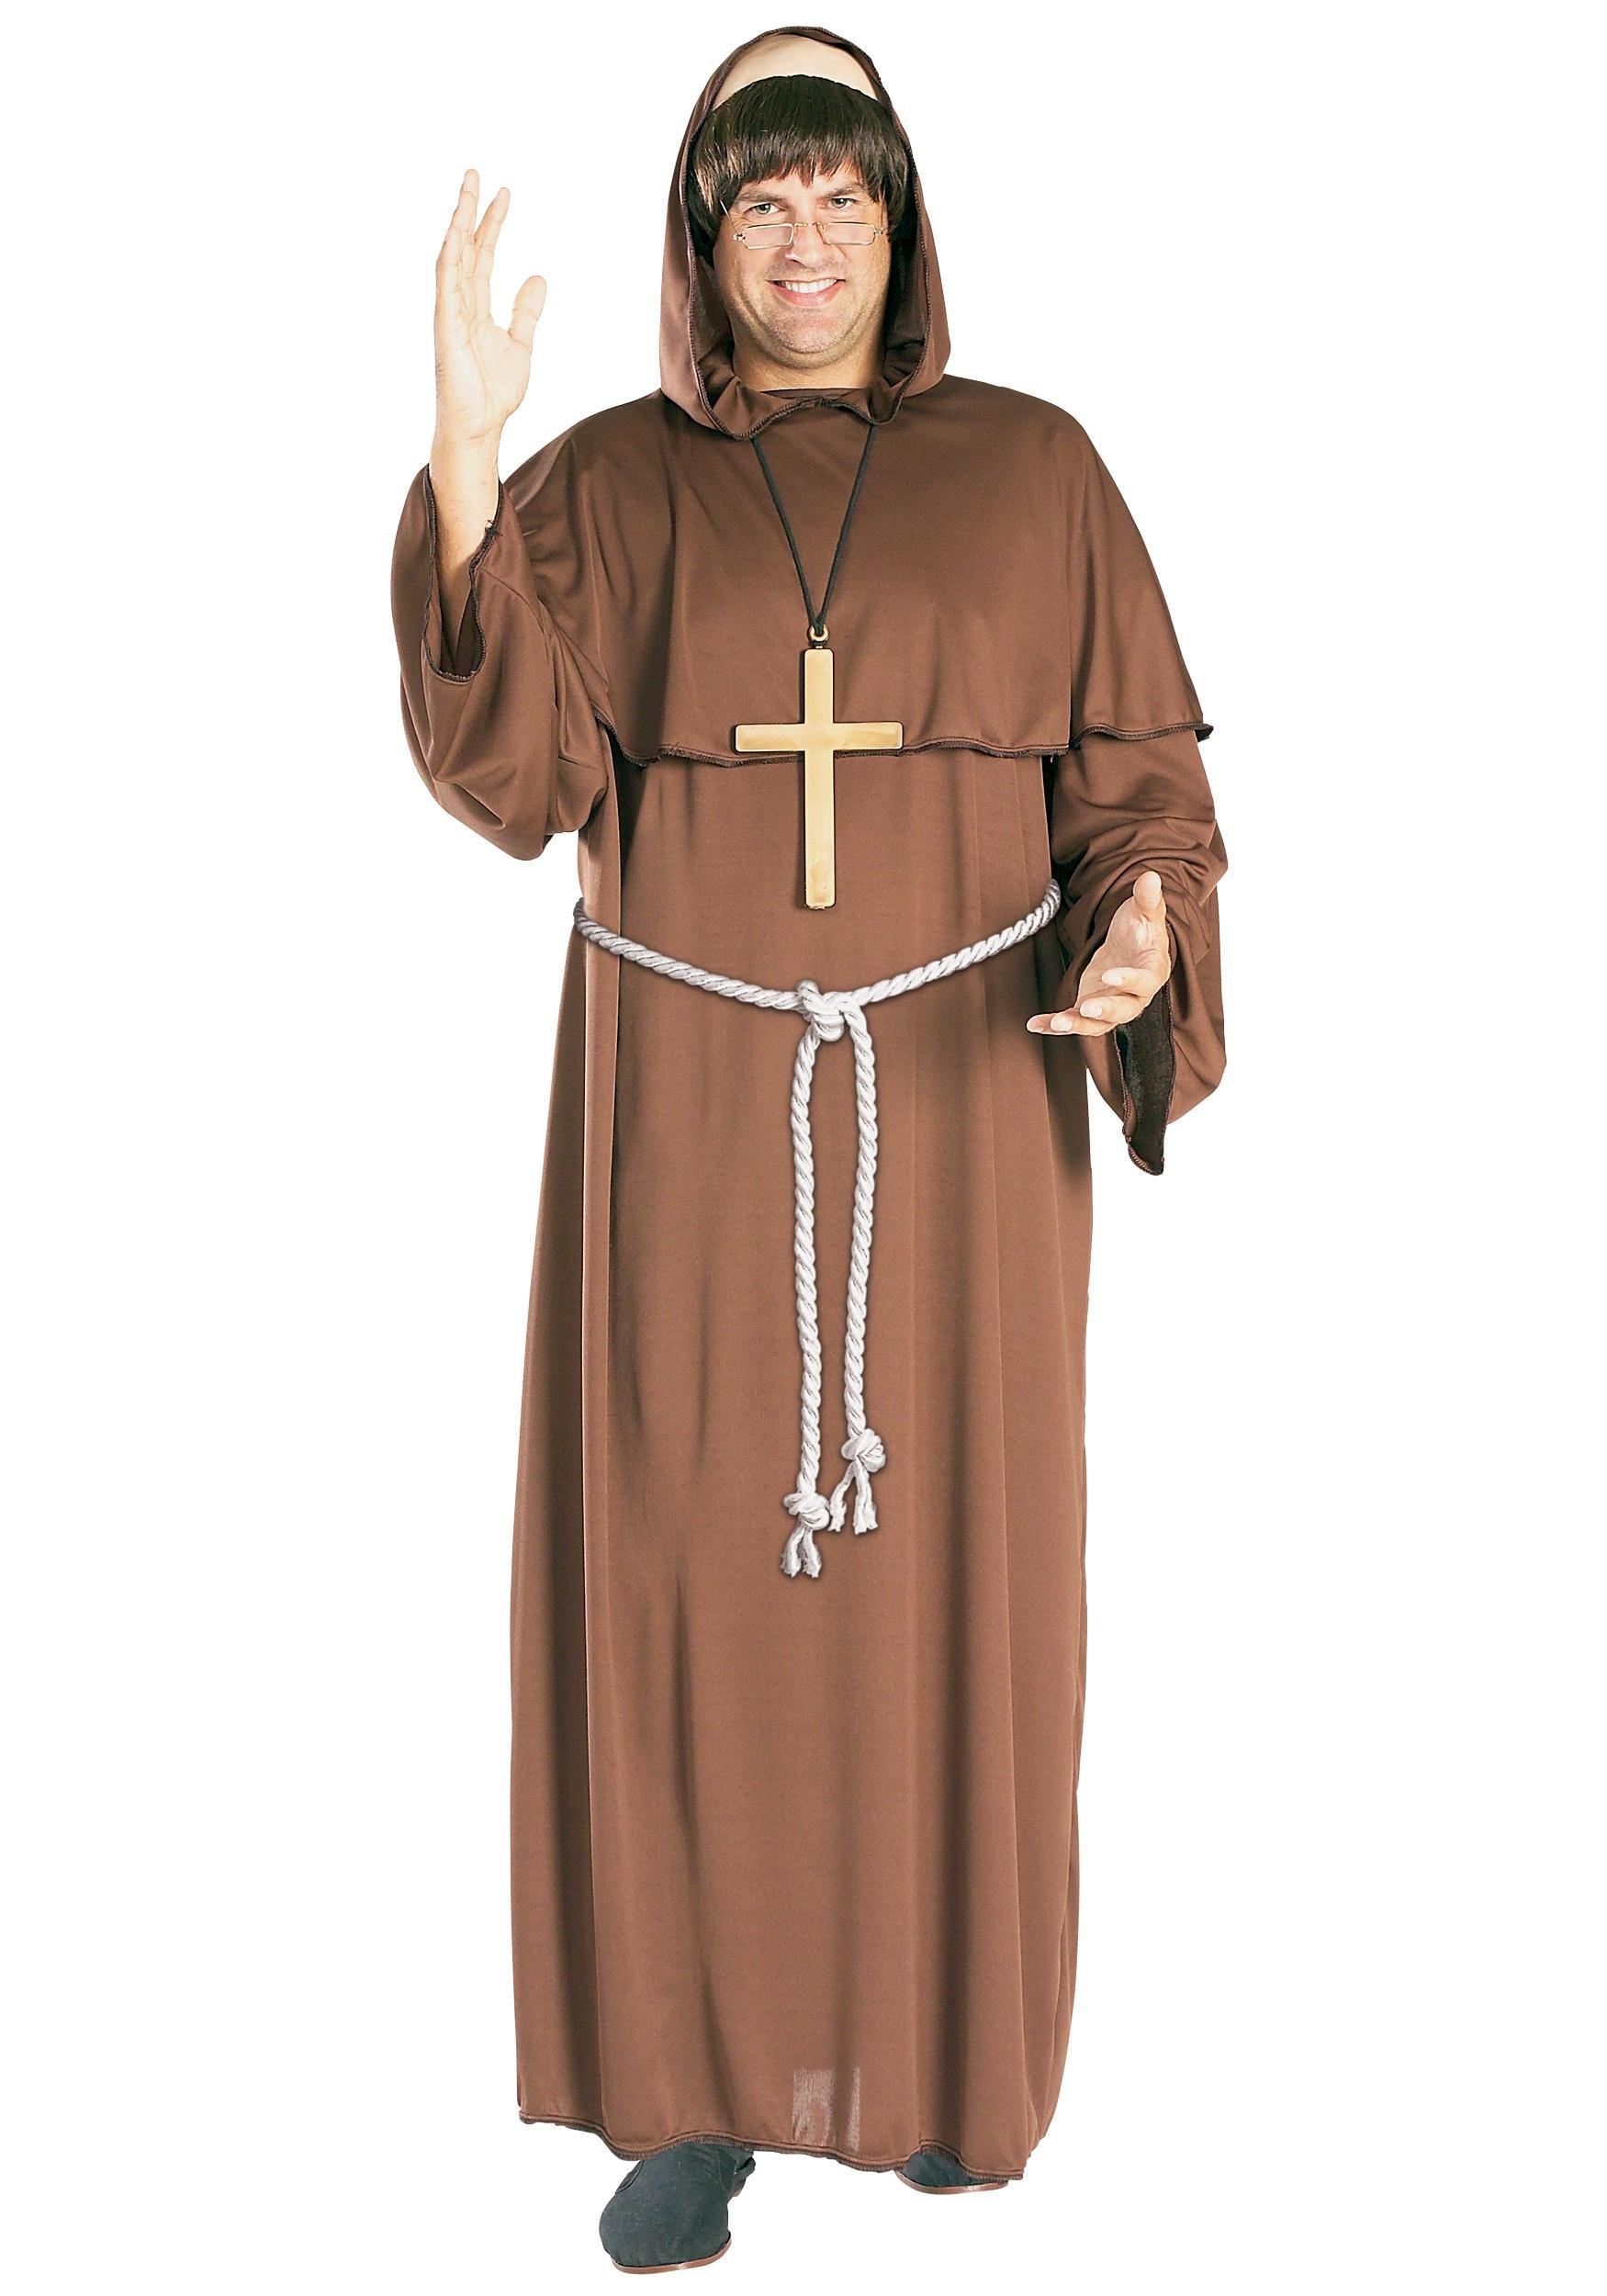 Sex monk priest tube nude fun actress